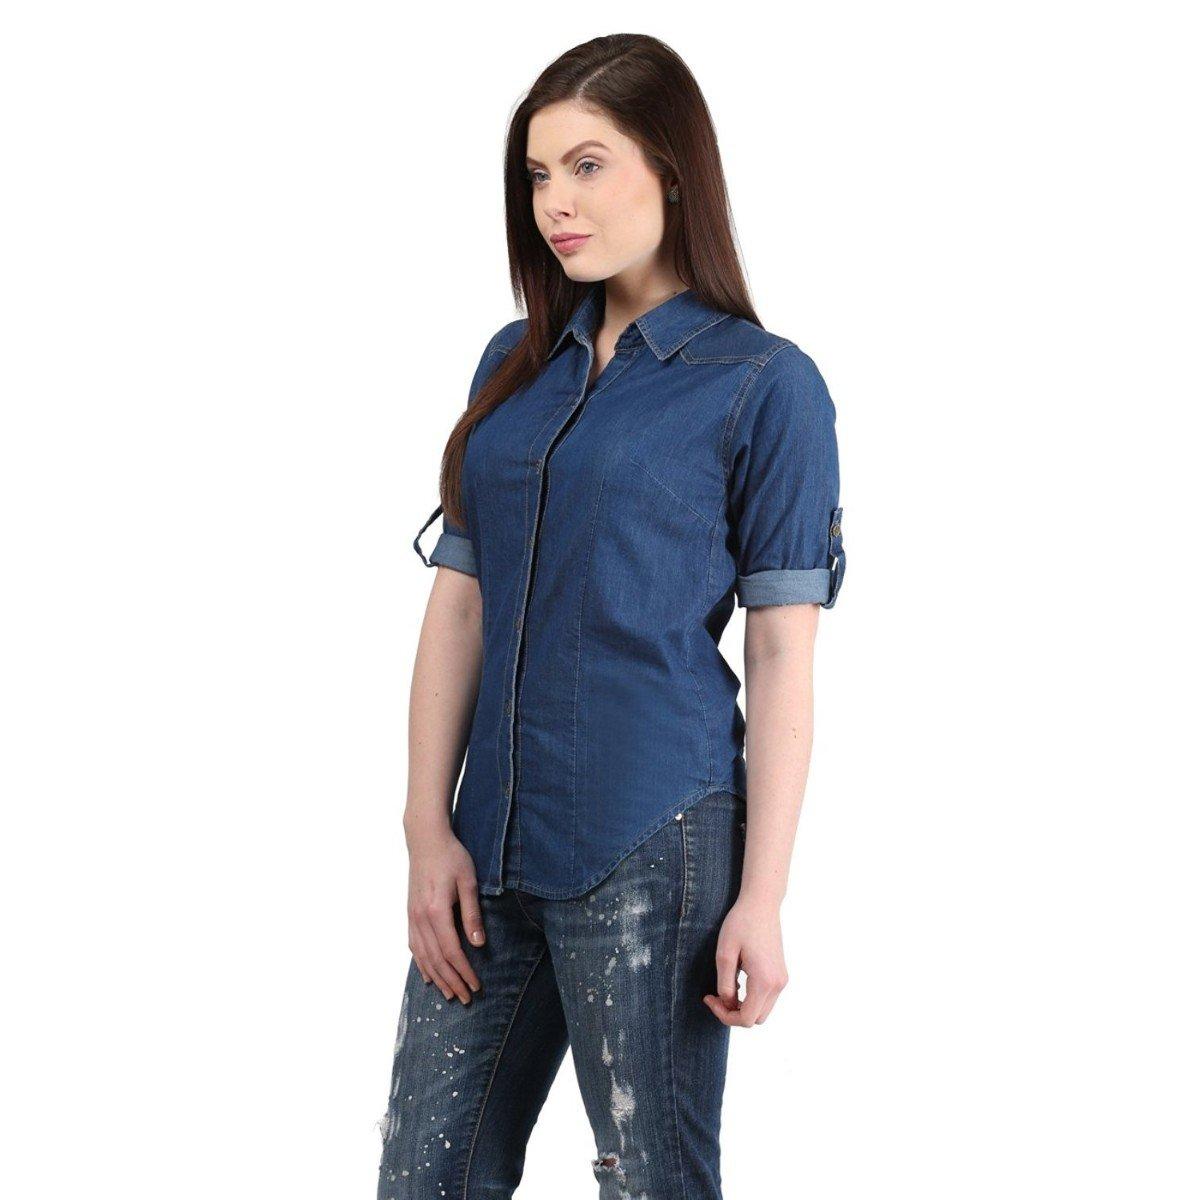 9c8c2ebb80 DIMPY GARMENTS BuyNewTrend Denim Shirt for Women Girls  Amazon.in  Clothing    Accessories